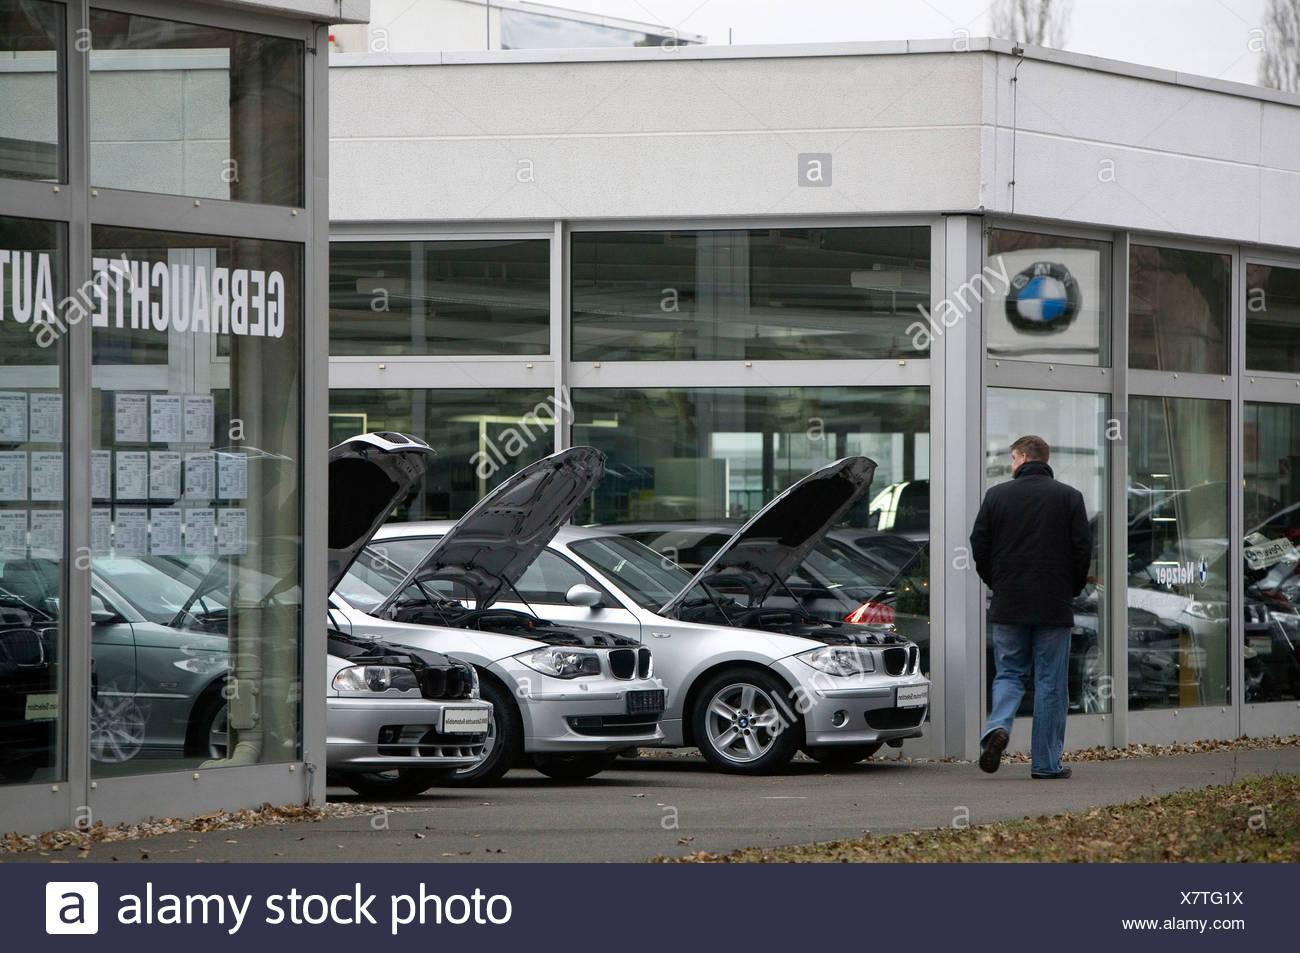 used car - Stock Image